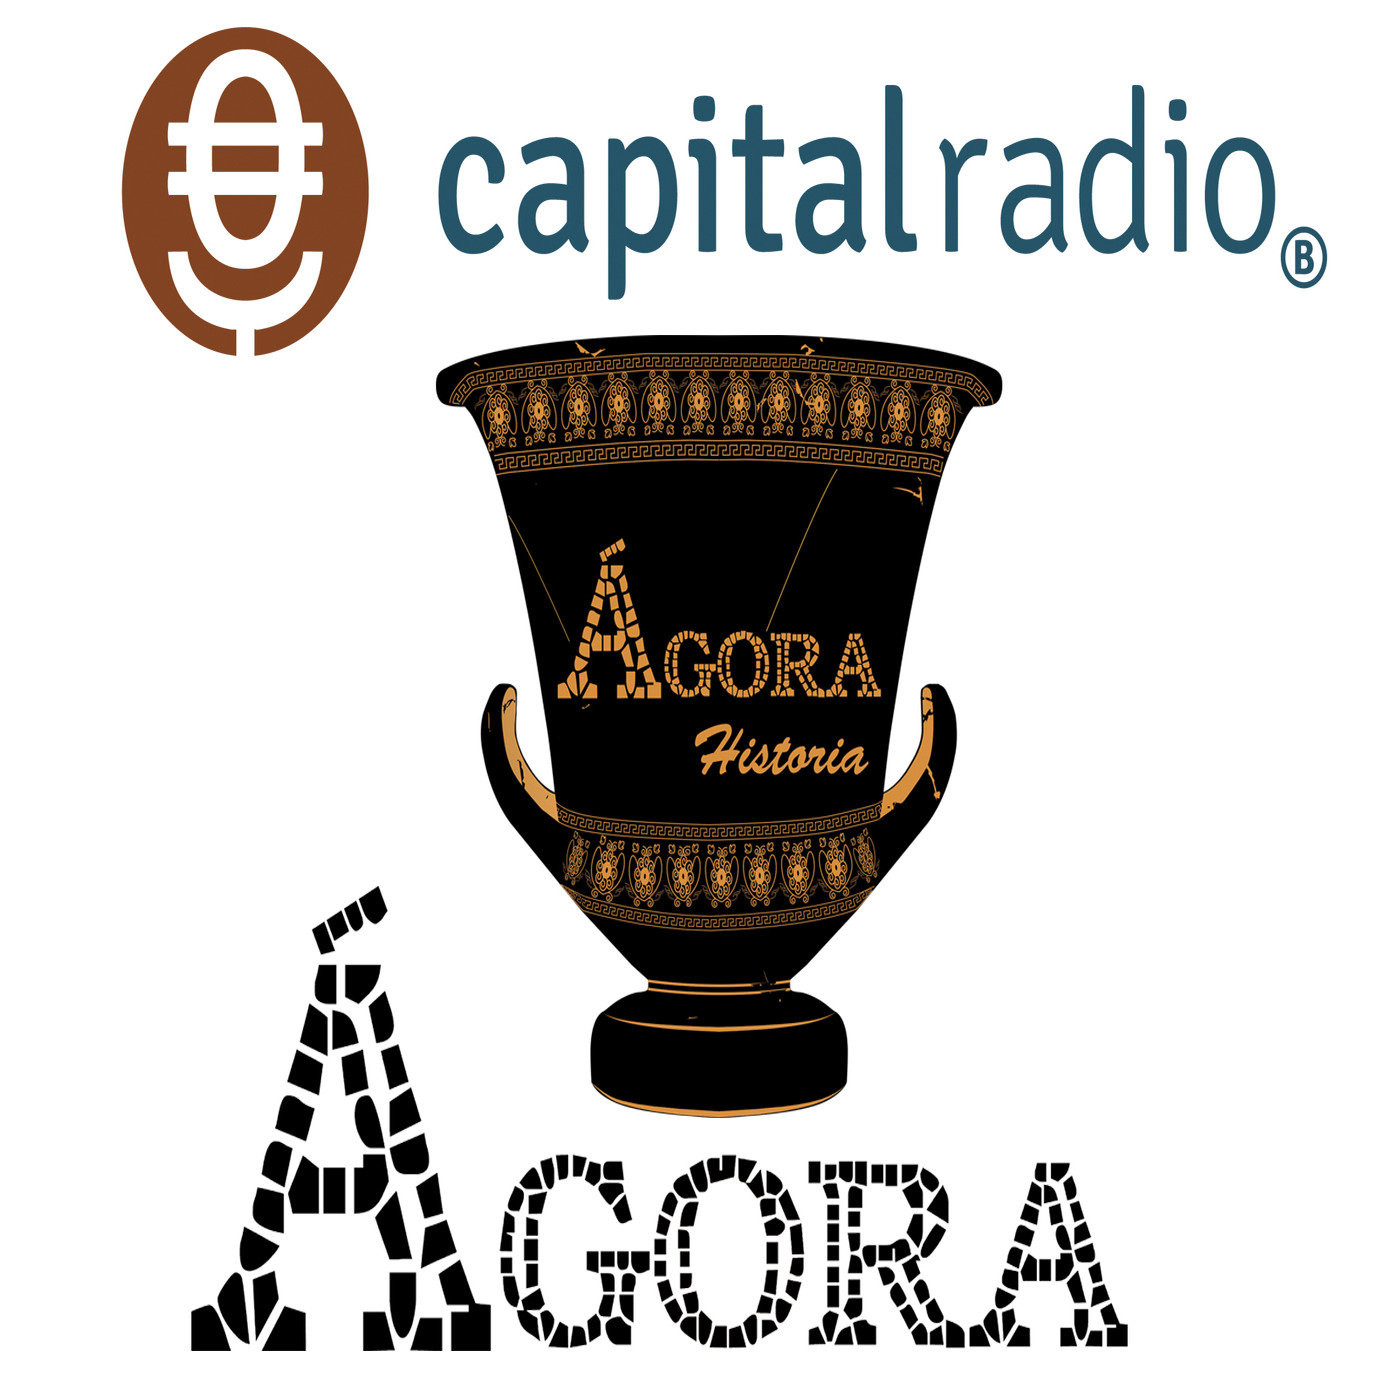 065 Agora Historia - Capital Radio - Legión Romana - Iberos imagen personal - Théodore Géricault